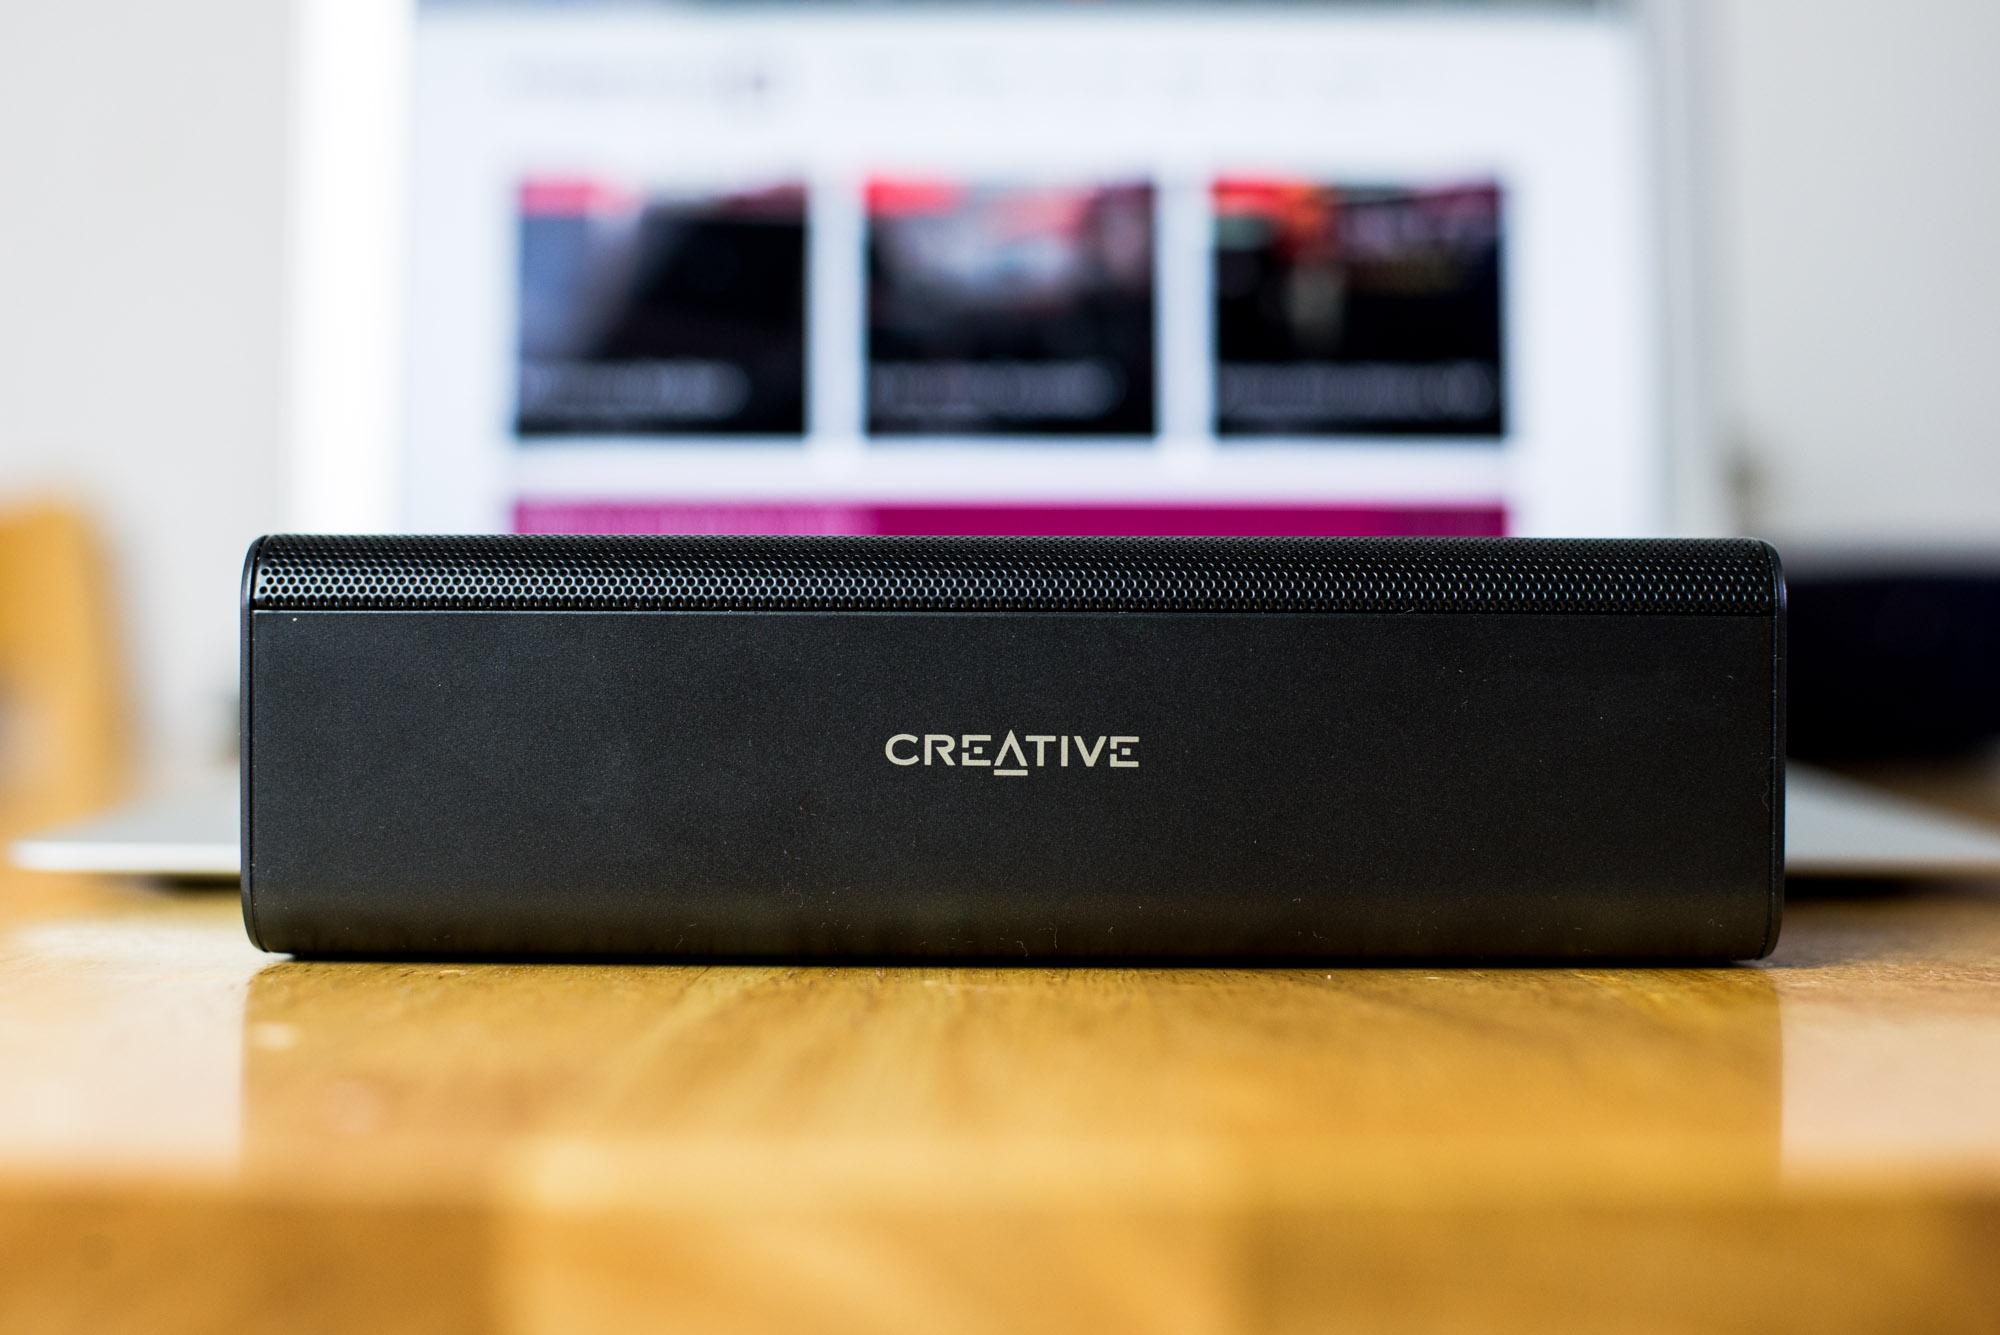 creative-roar-2-6